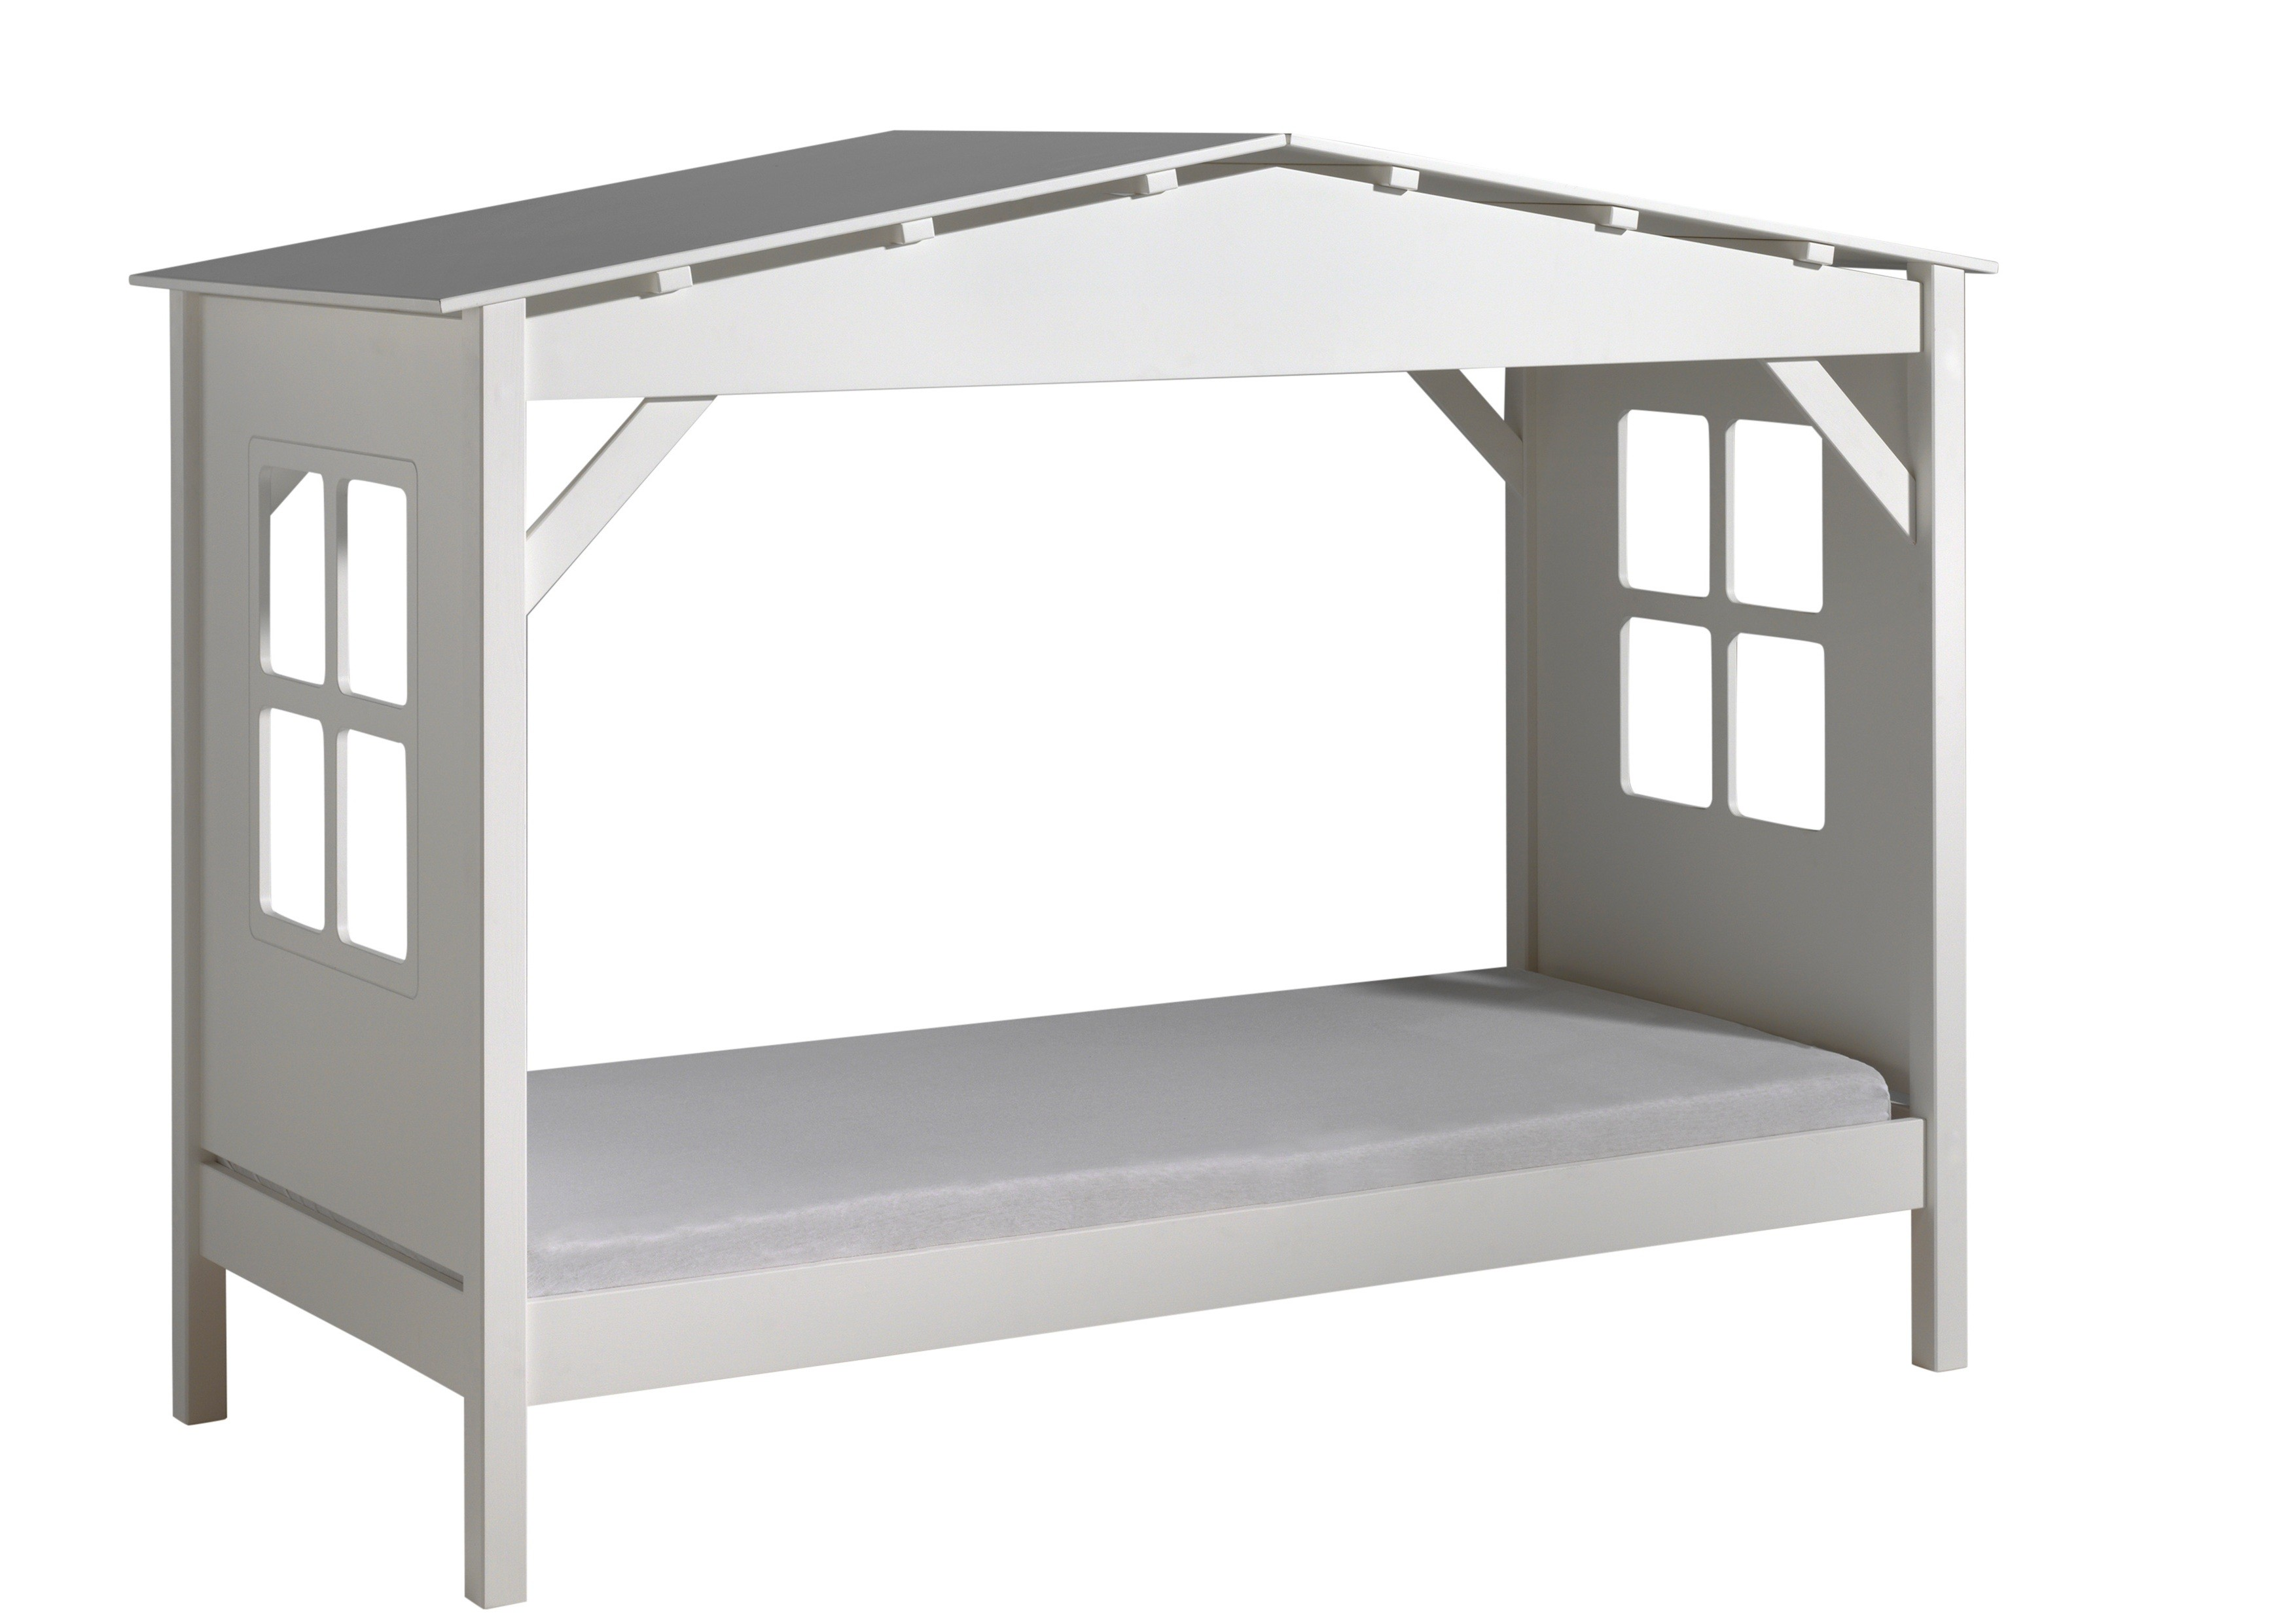 lit cabane pin massif blanc pinie 90 mod le sans tiroir. Black Bedroom Furniture Sets. Home Design Ideas